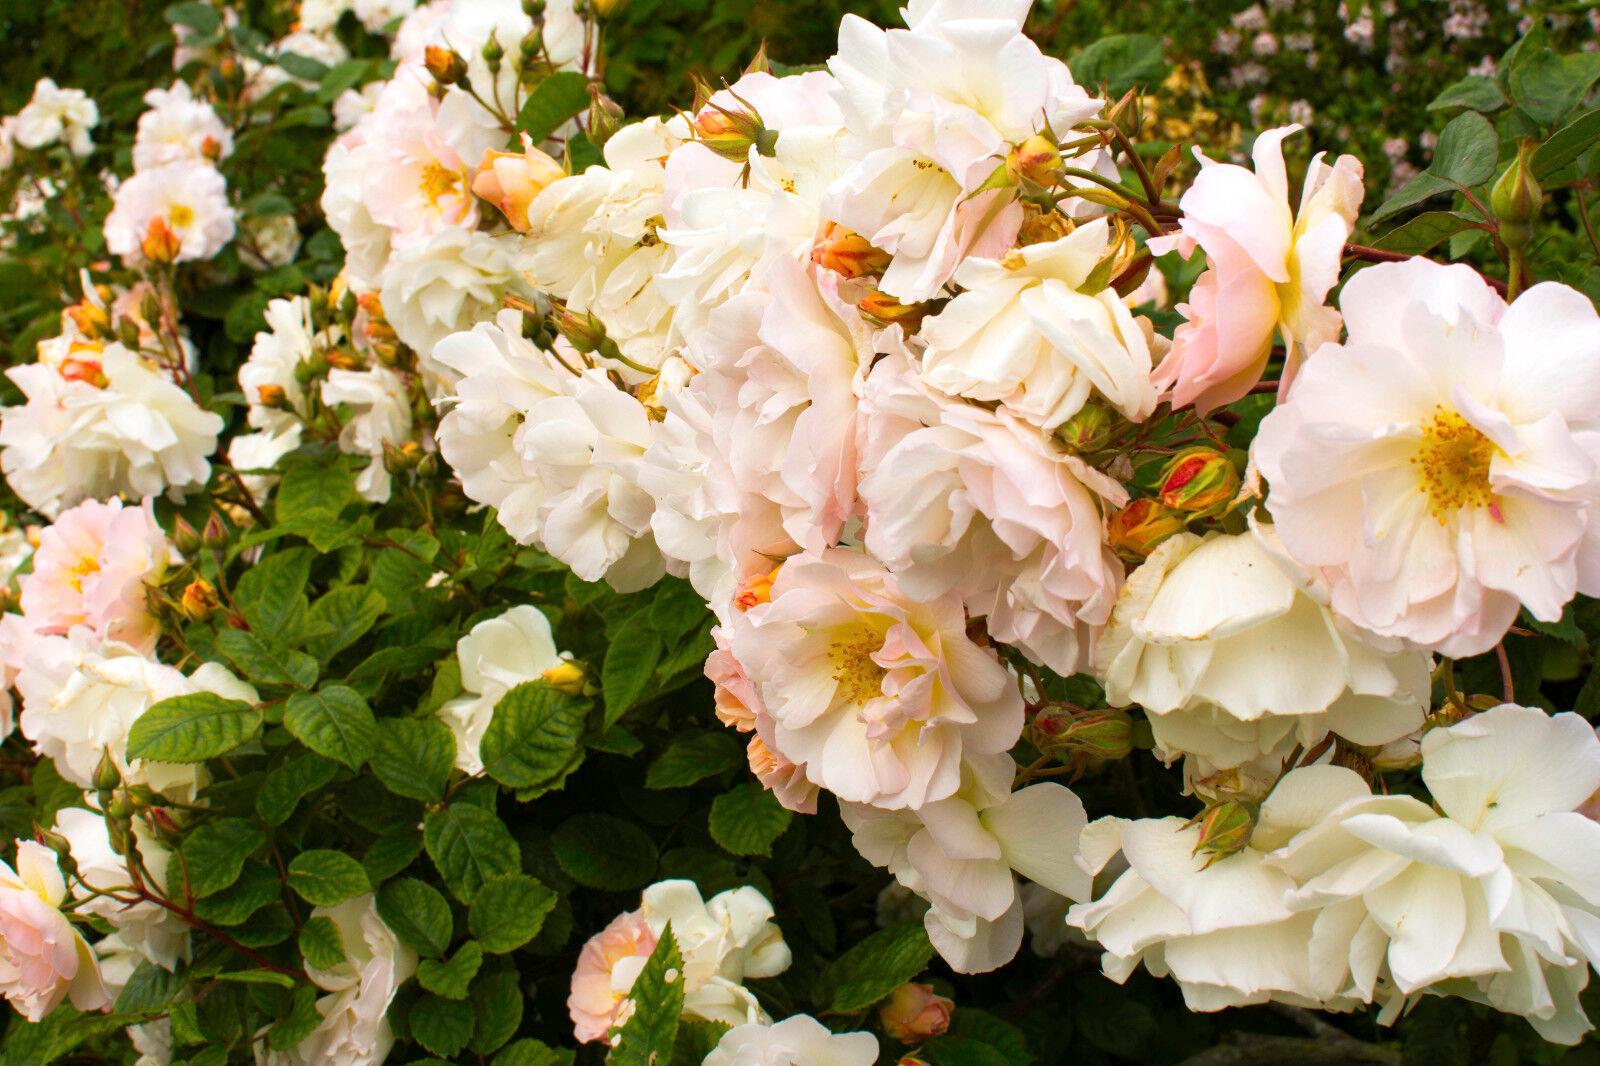 Pauls himalayan musk rambling rose with double pale pink flowers pauls himalayan musk rambling rose with double pale pink flowers mightylinksfo